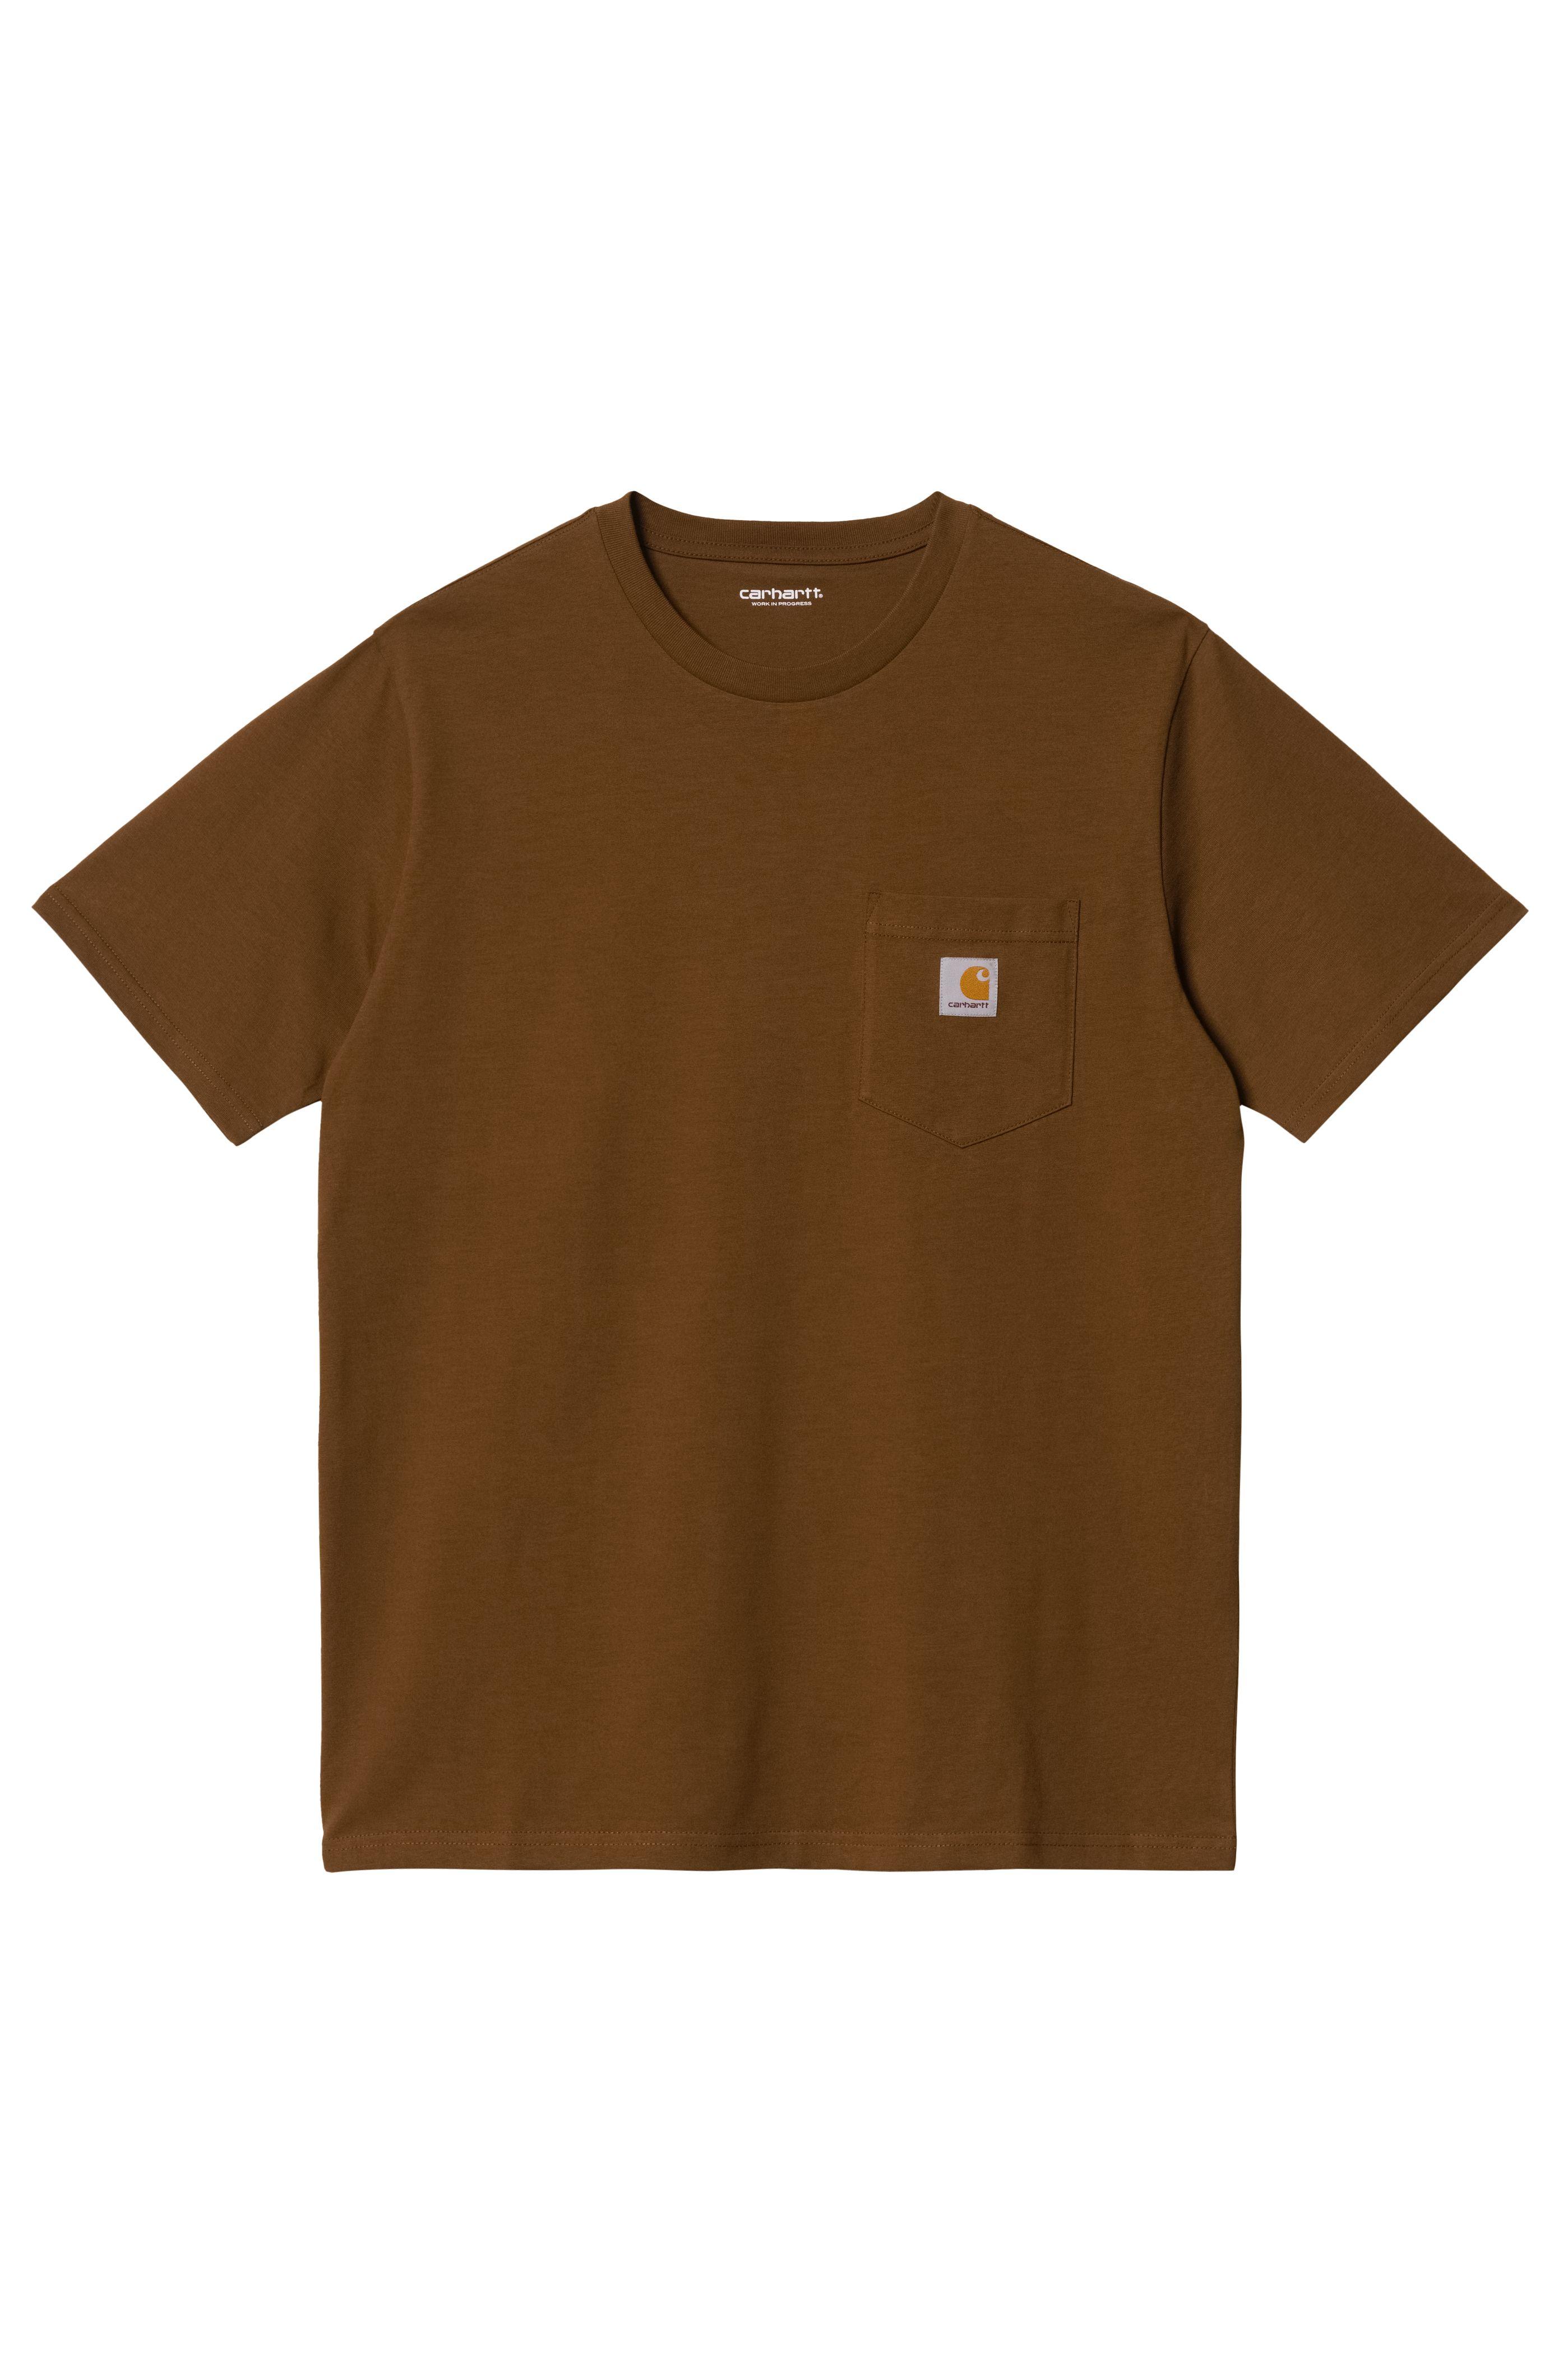 Carhartt WIP T-Shirt POCKET Tawny